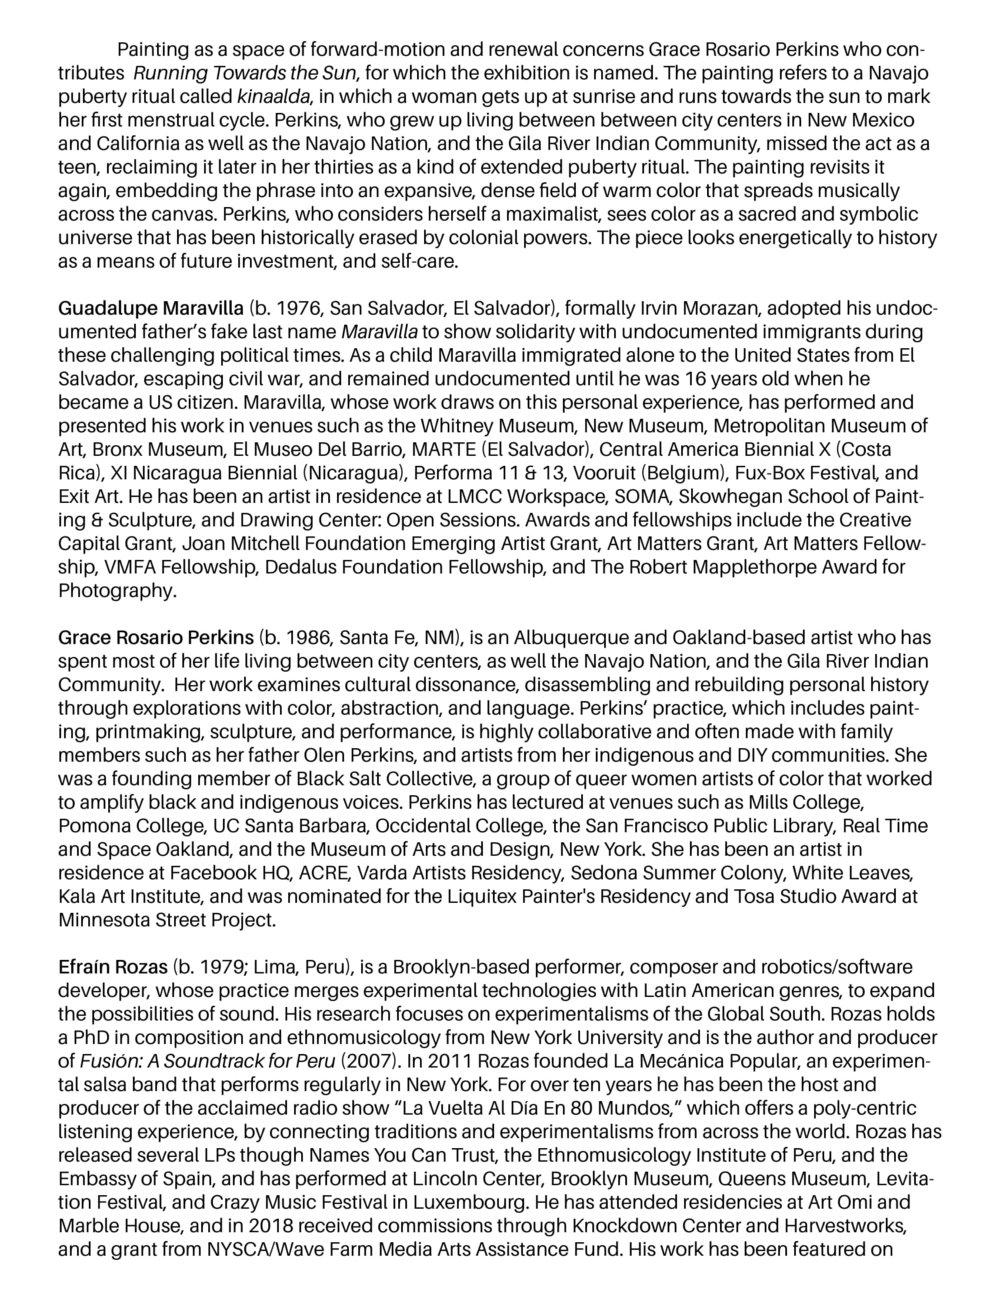 Running Towards the Sun Press Release (dragged) 2-1.jpg